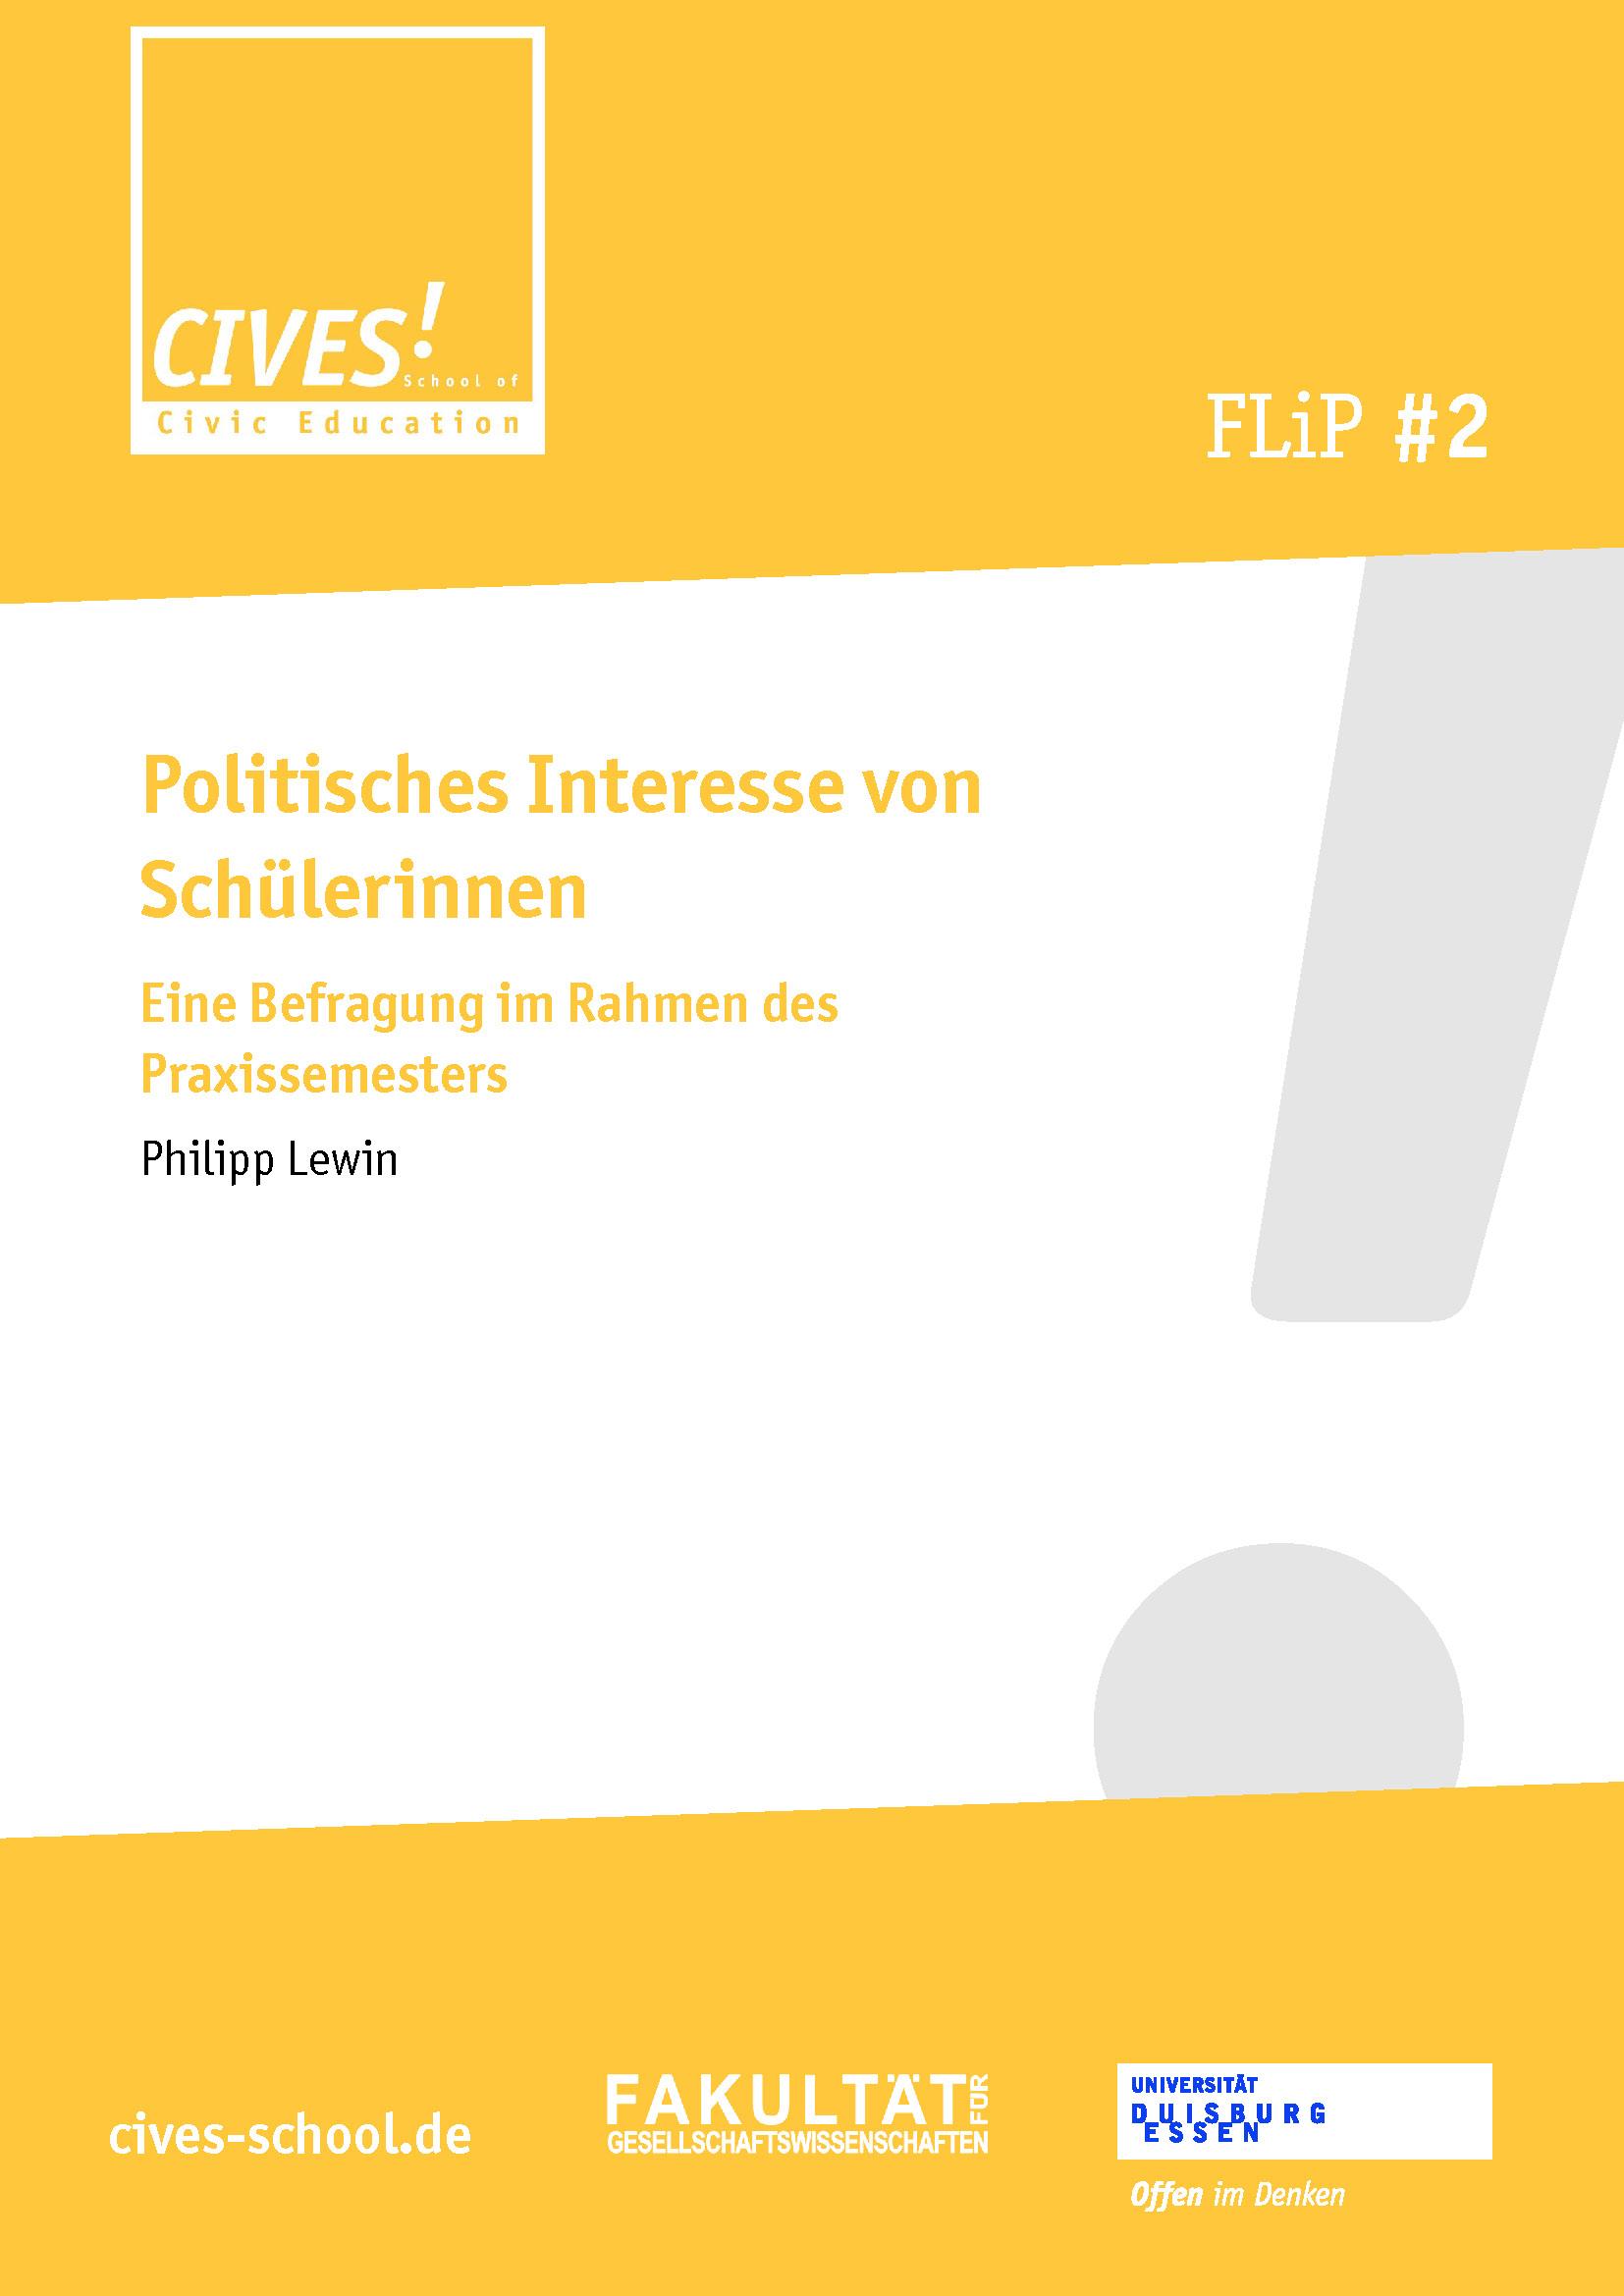 Cives-FLiP-#2